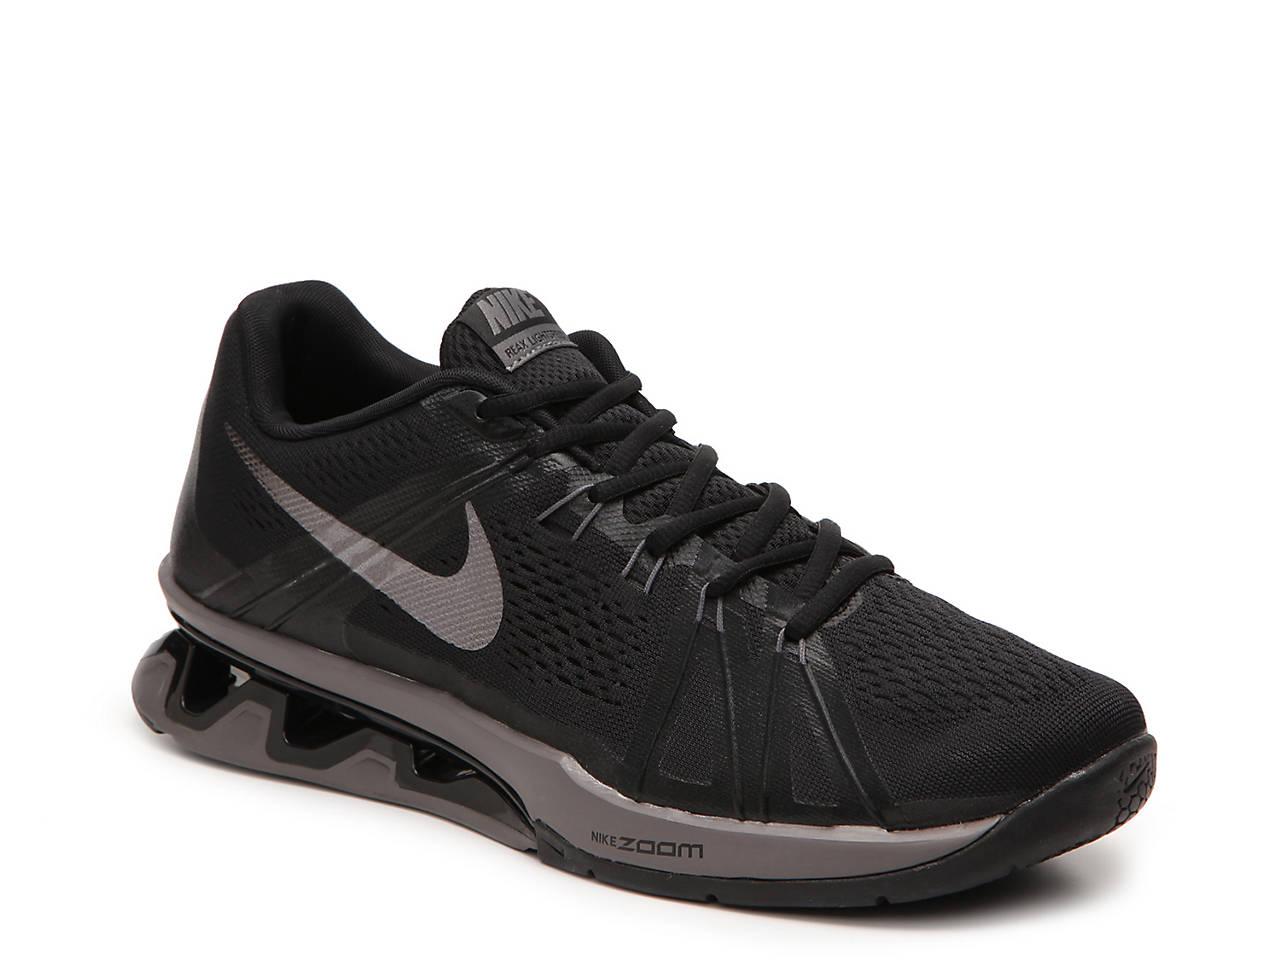 9f4d8f6a768a Nike Reax Lightspeed Training Shoe - Men s Men s Shoes